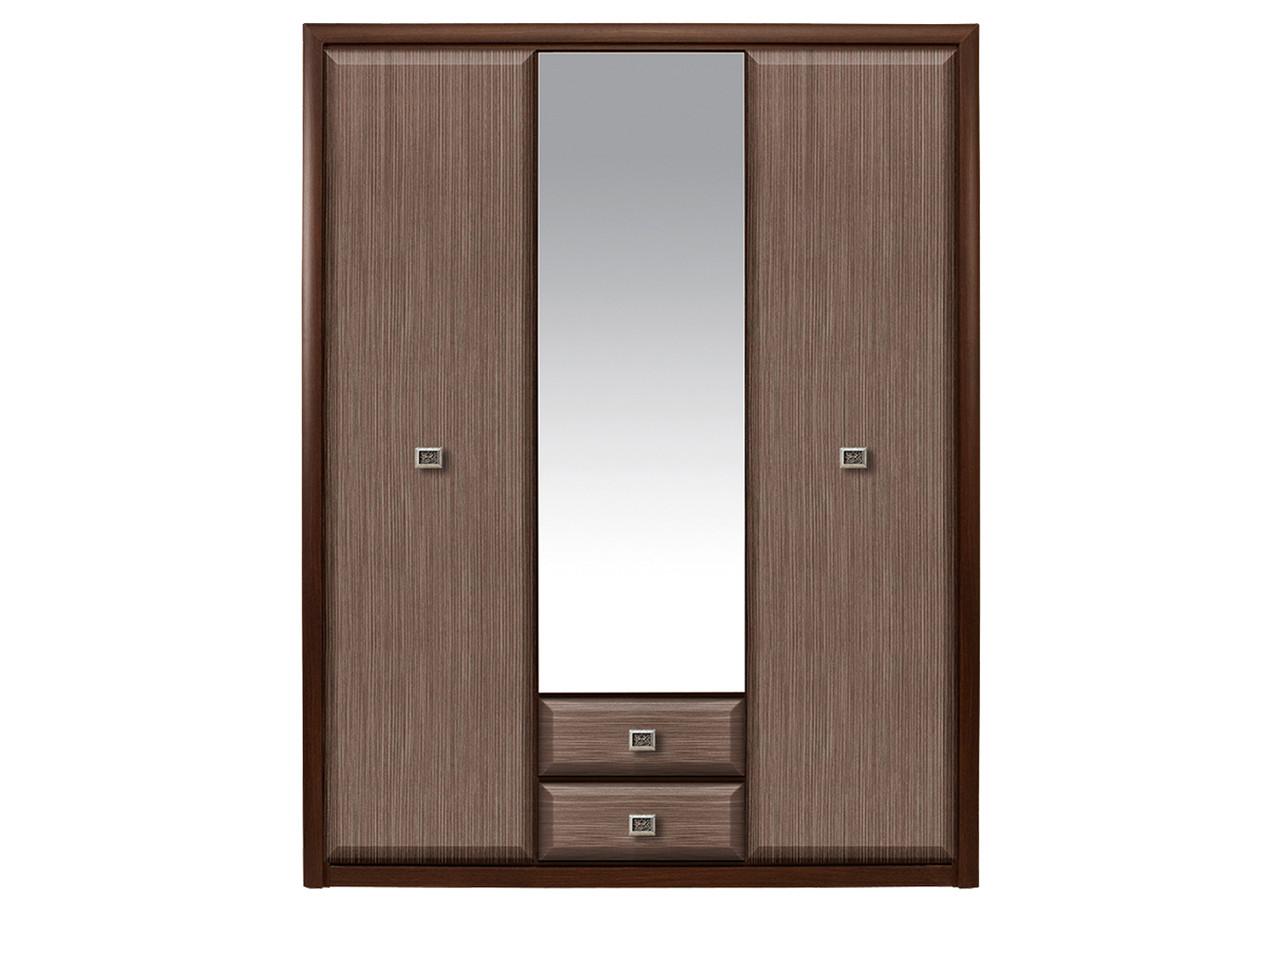 Шкаф для одежды 3Д , коллекции Коен МДФ, Штрокс Темный, БРВ Брест (Беларусь)